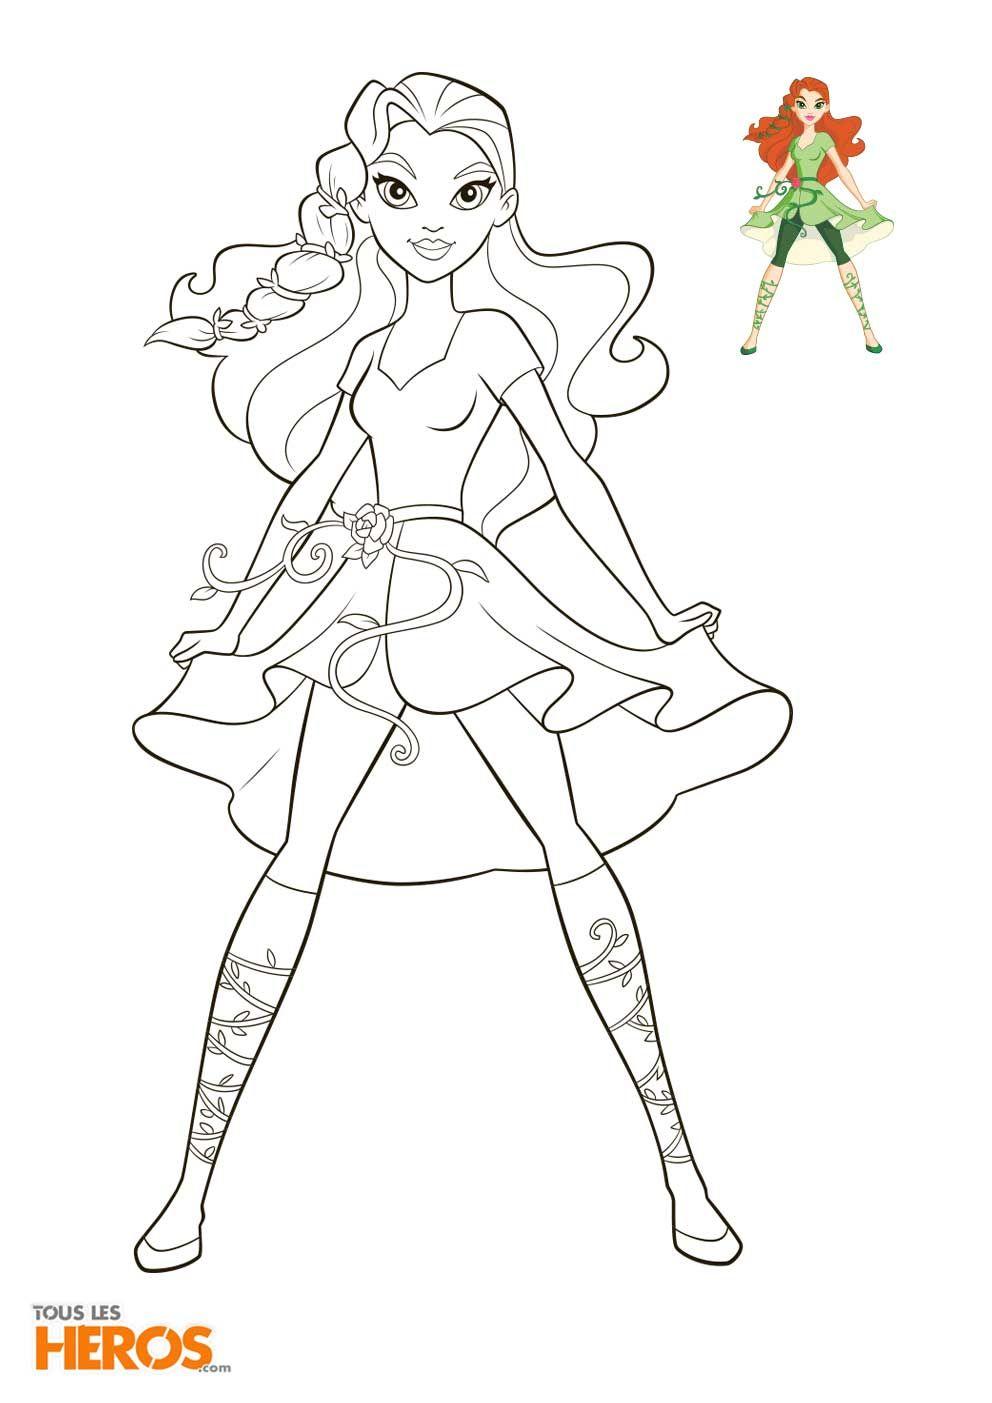 Coloriage Dc Super Hero Girls3 Jpg 992 1403 Coloriage Super Heros Coloriage Coloriage Ladybug